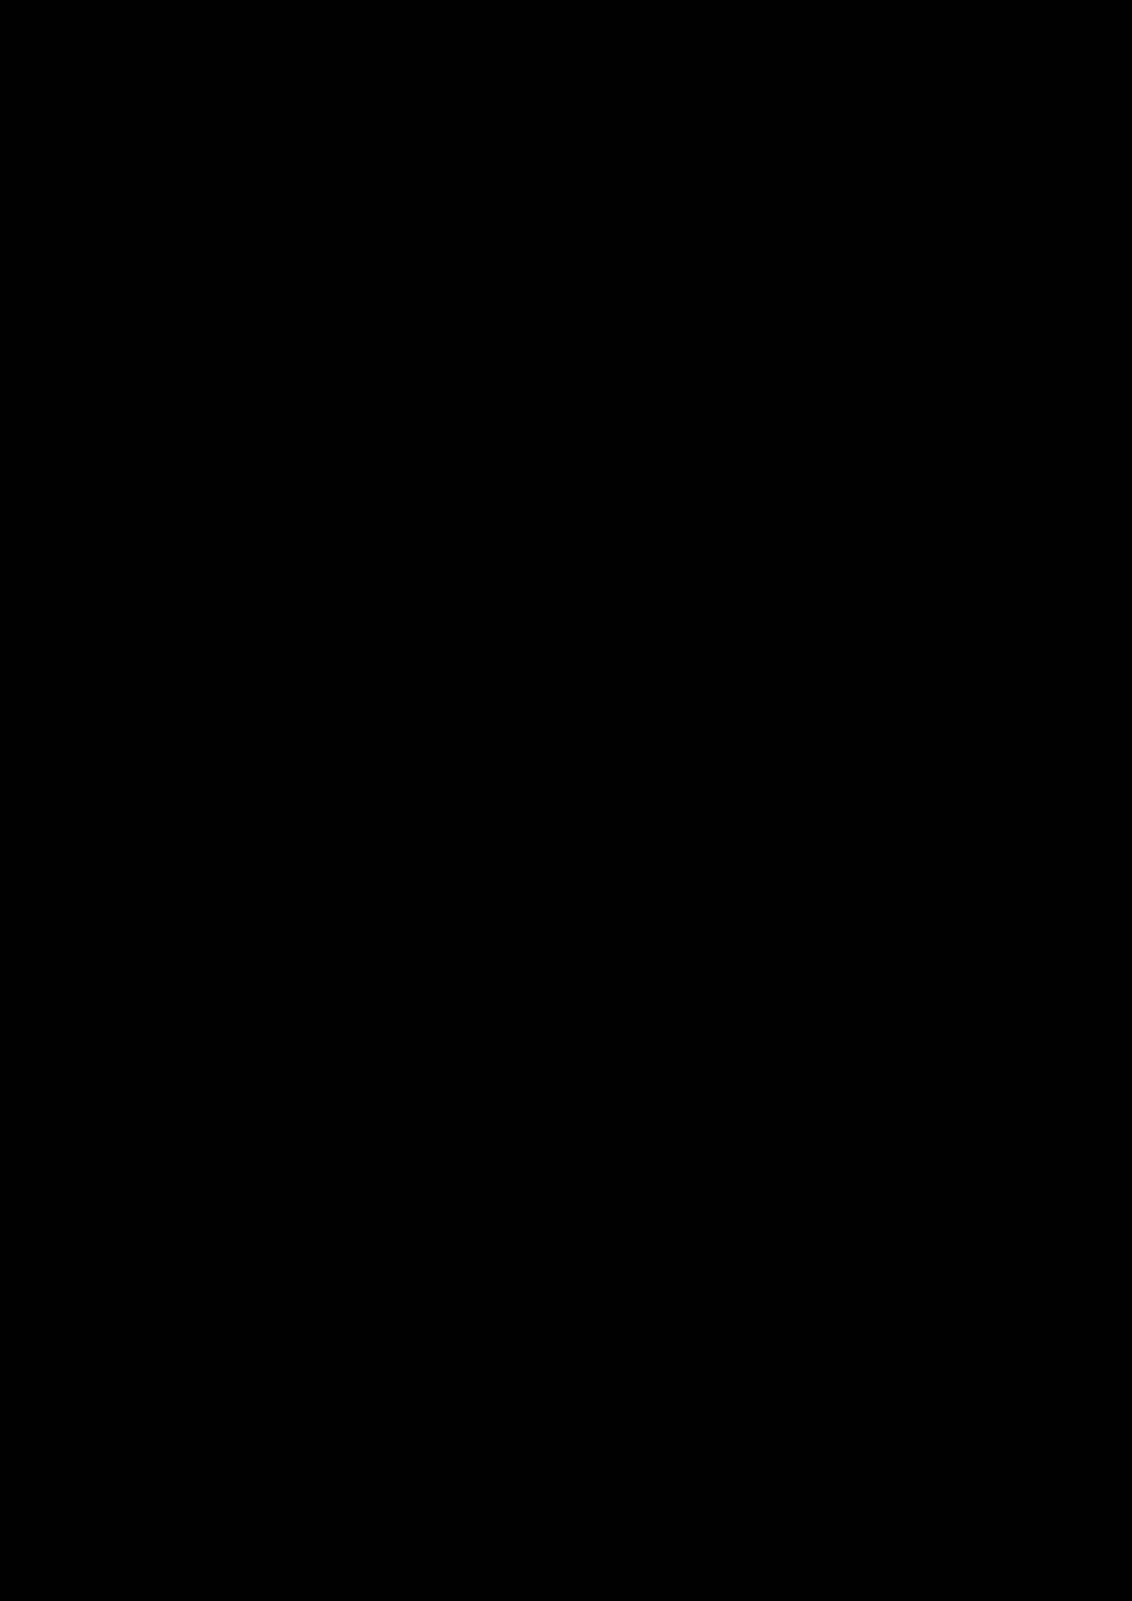 Prosti slide, Image 38